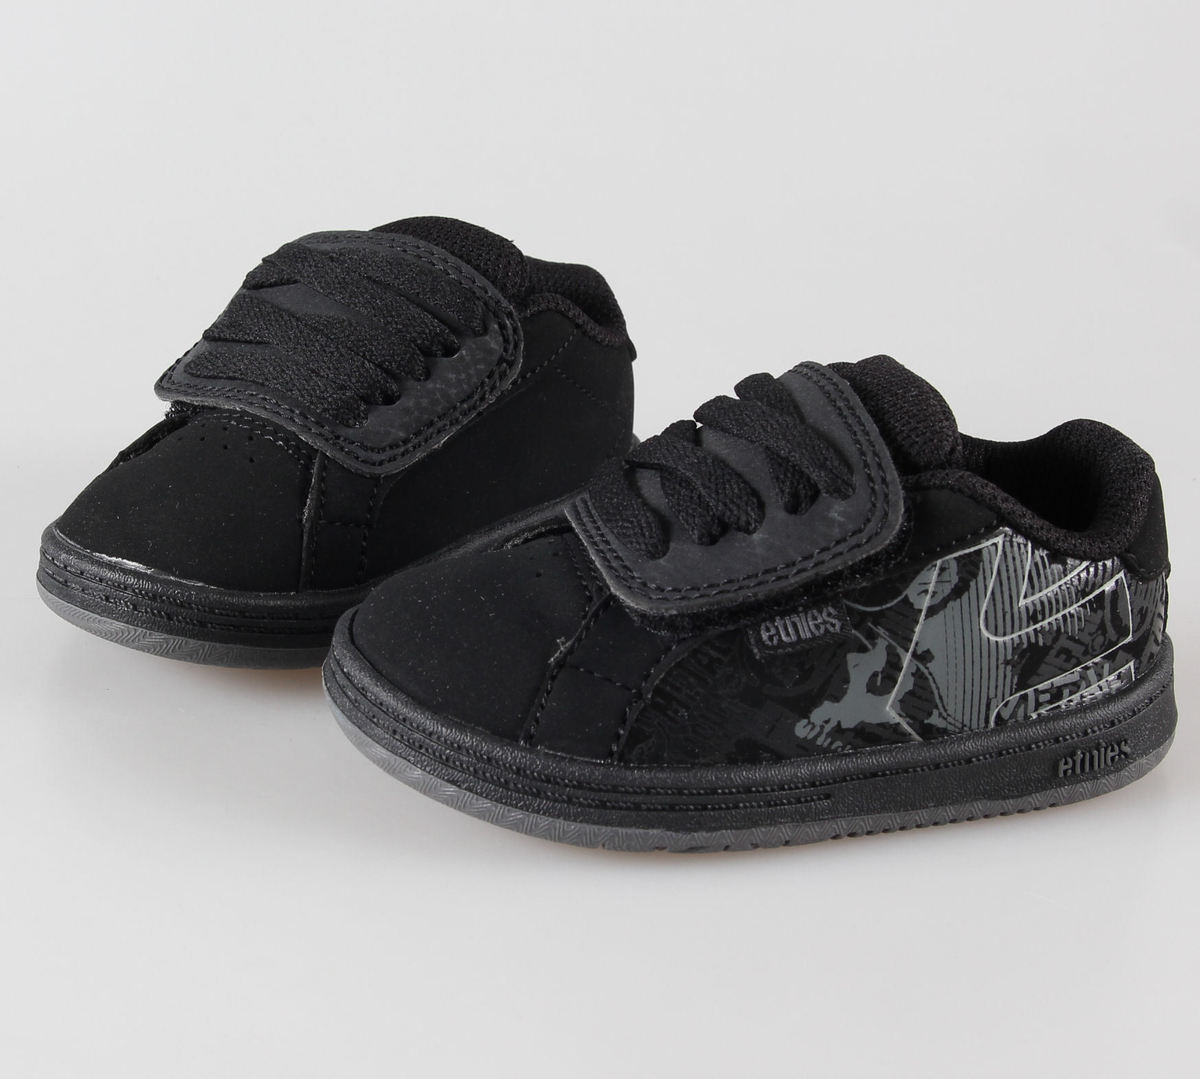 boty dětské ETNIES - Toddler Metal Mulisha Fader - Black/Dark Grey/Grey